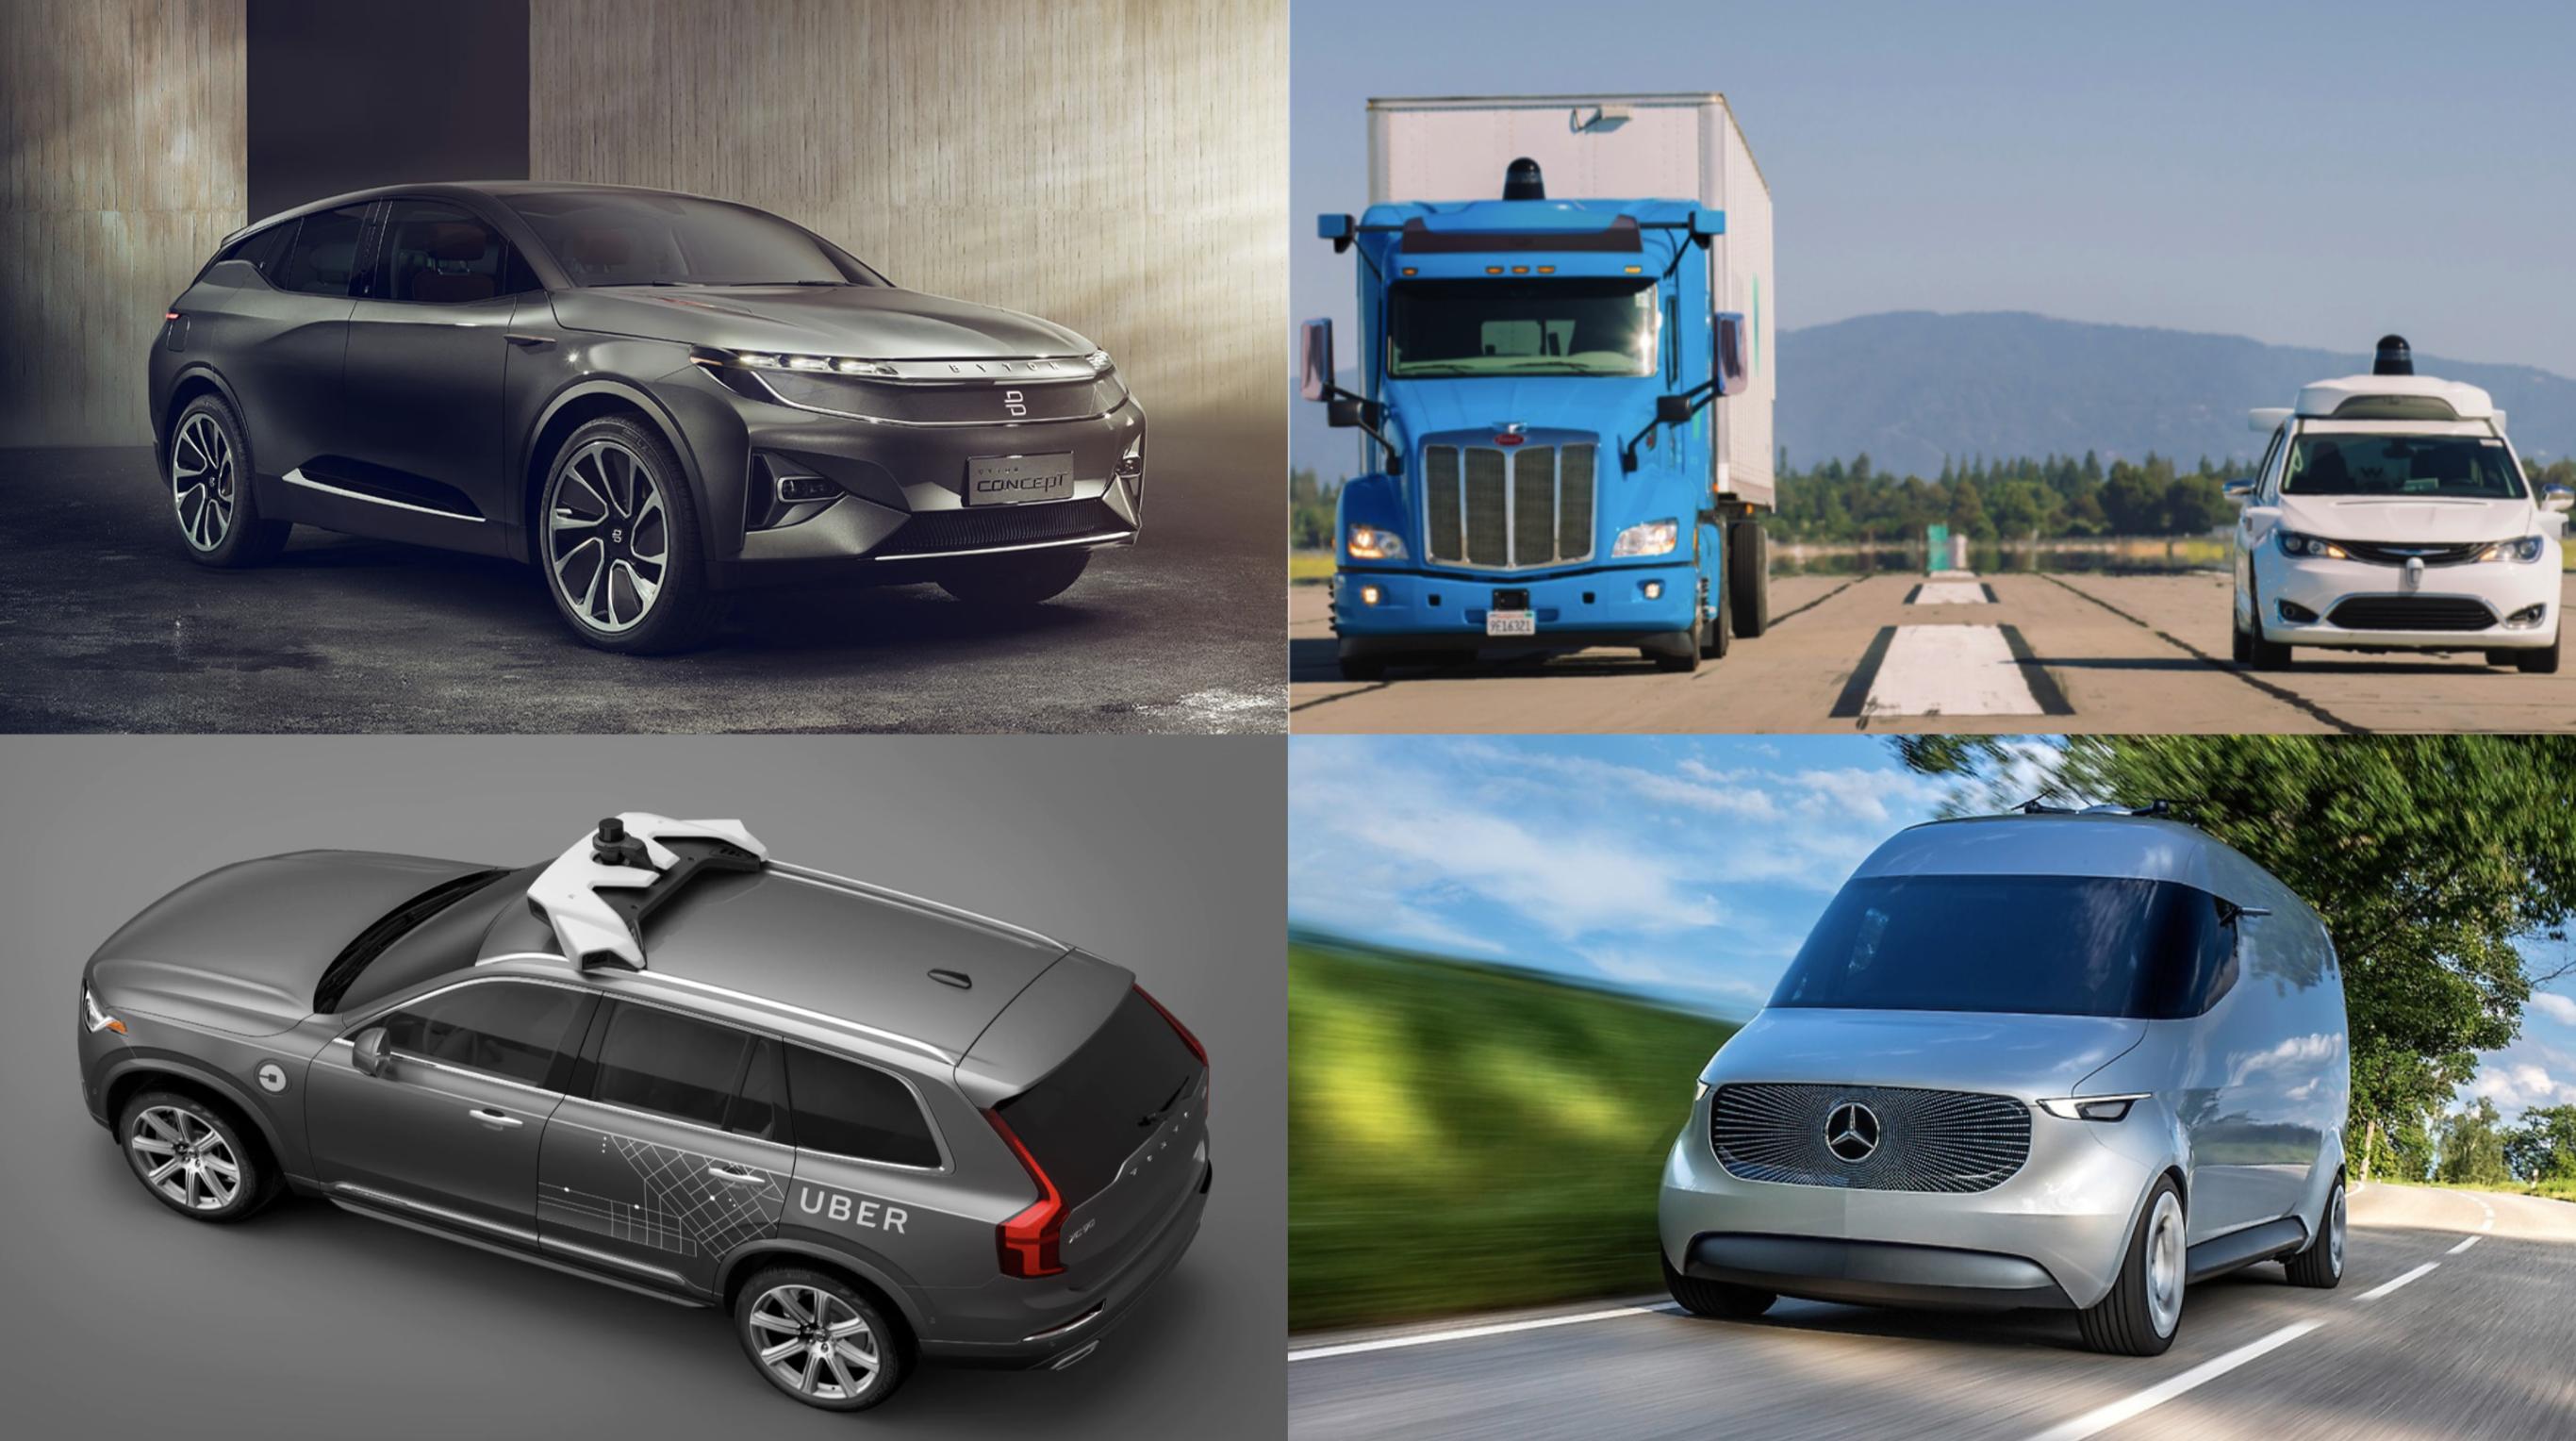 The Evolution of the Self-Driving Car Market Landscape